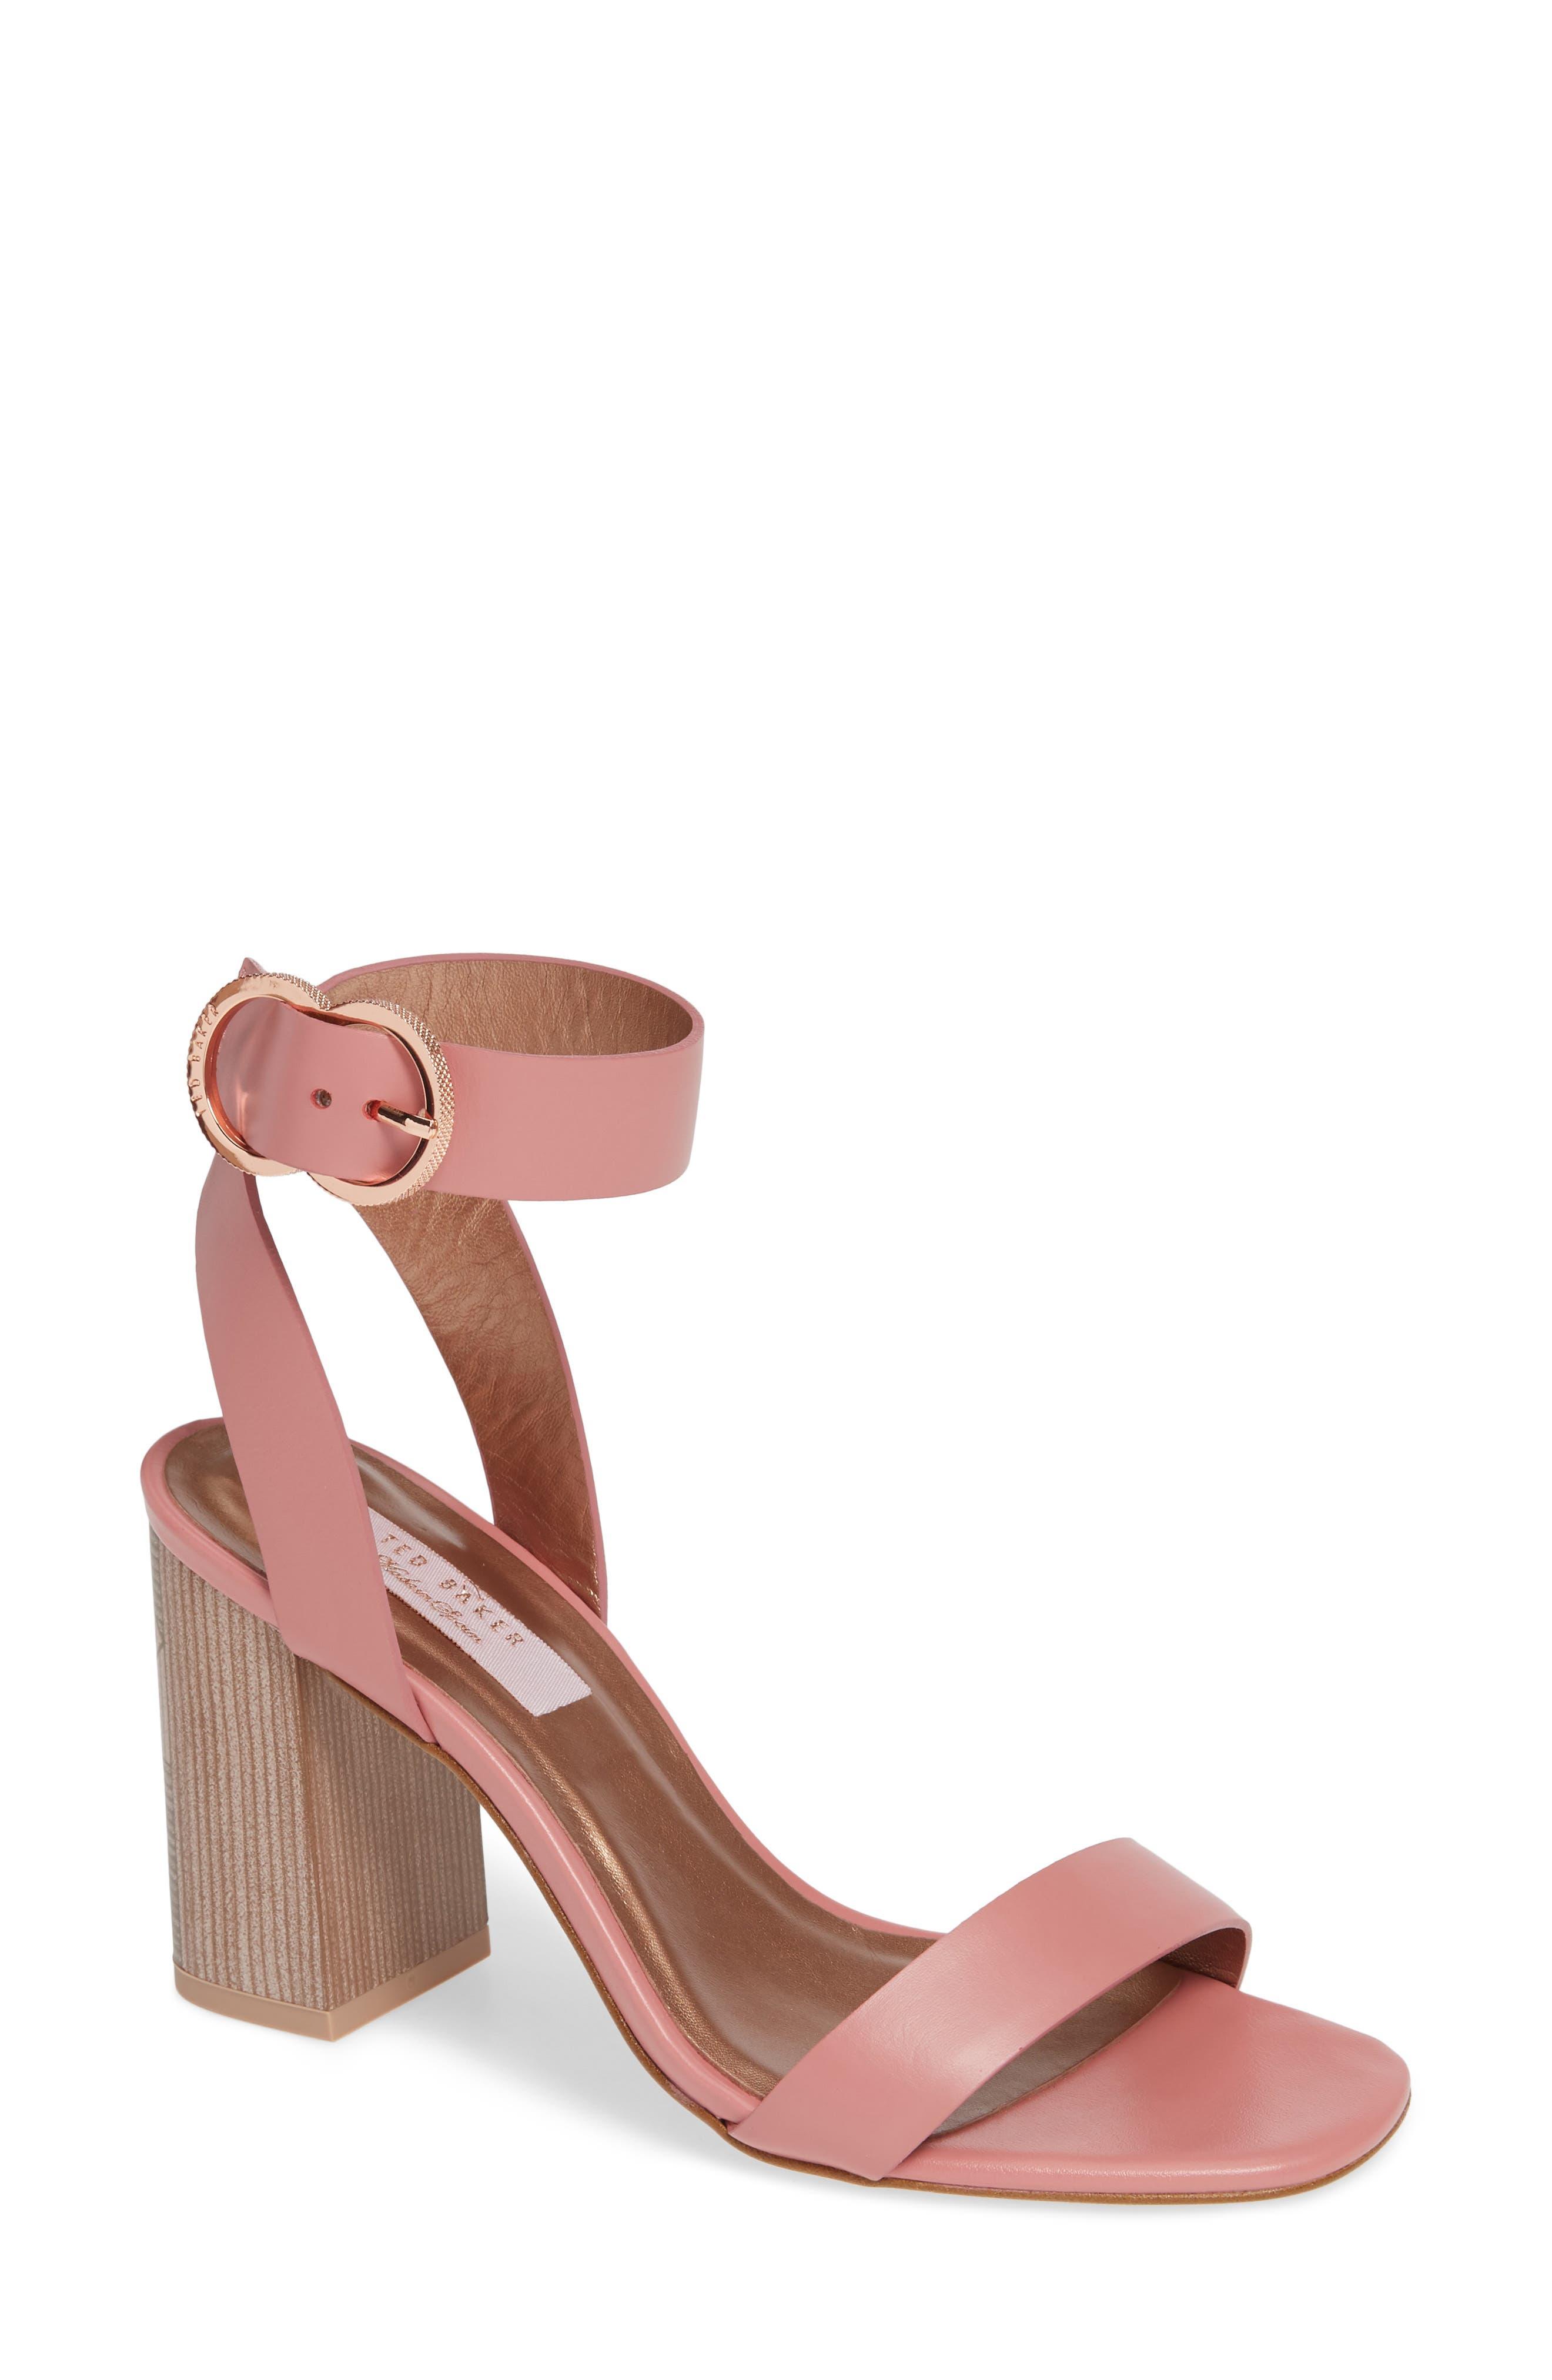 Vallama Block Heel Sandal,                         Main,                         color, PINK LEATHER